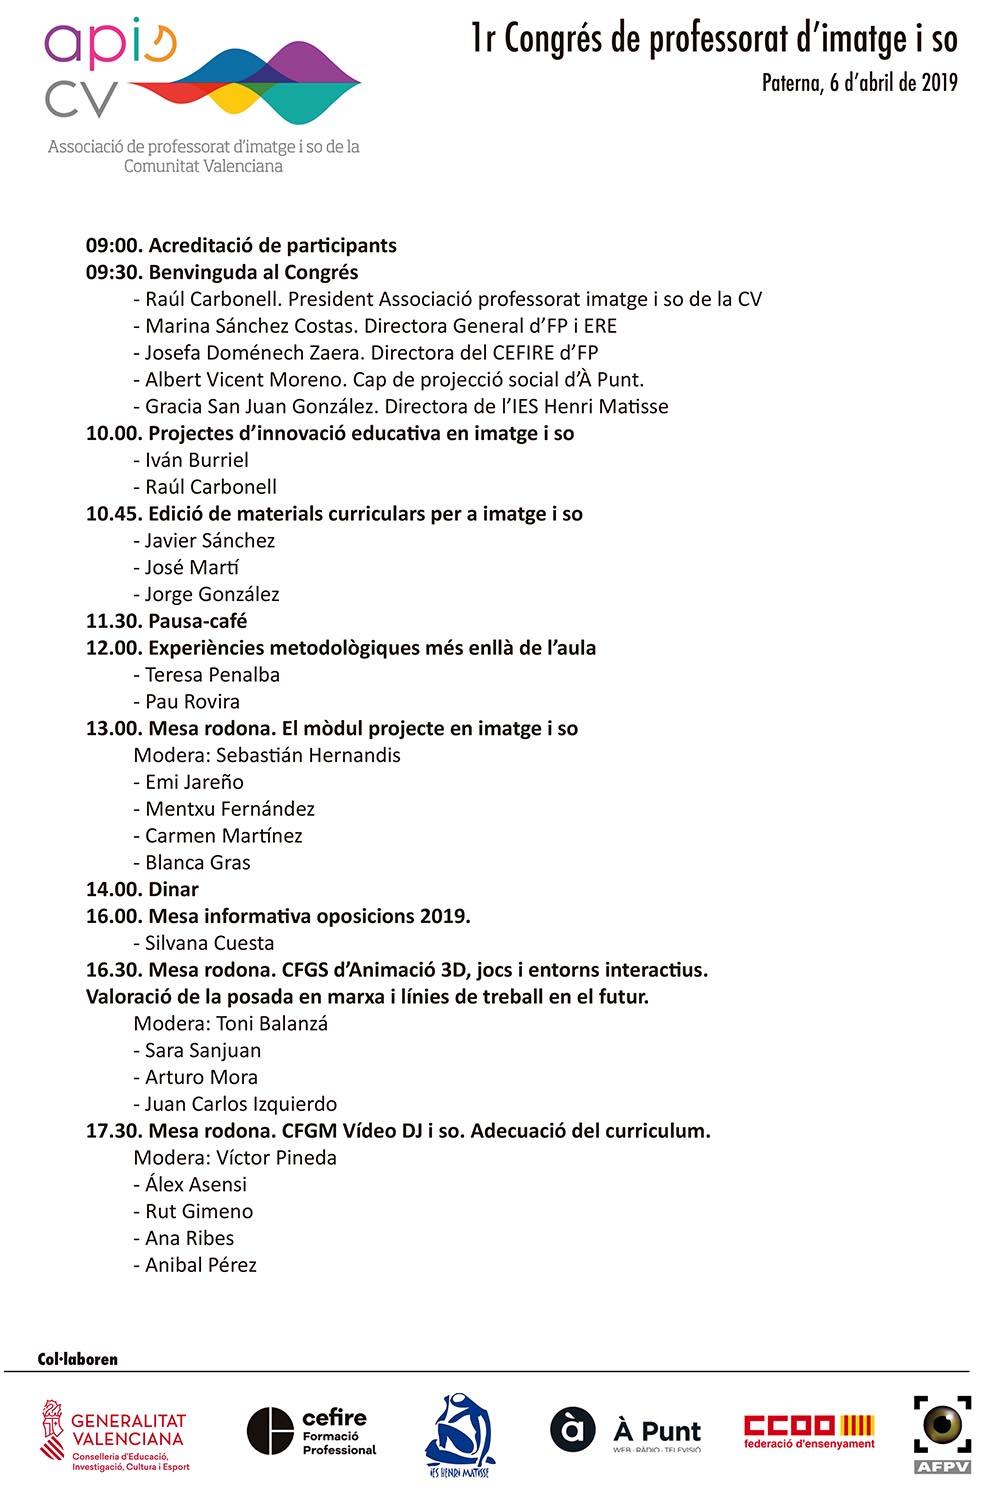 programa-congreso-apiscv-2019.jpg